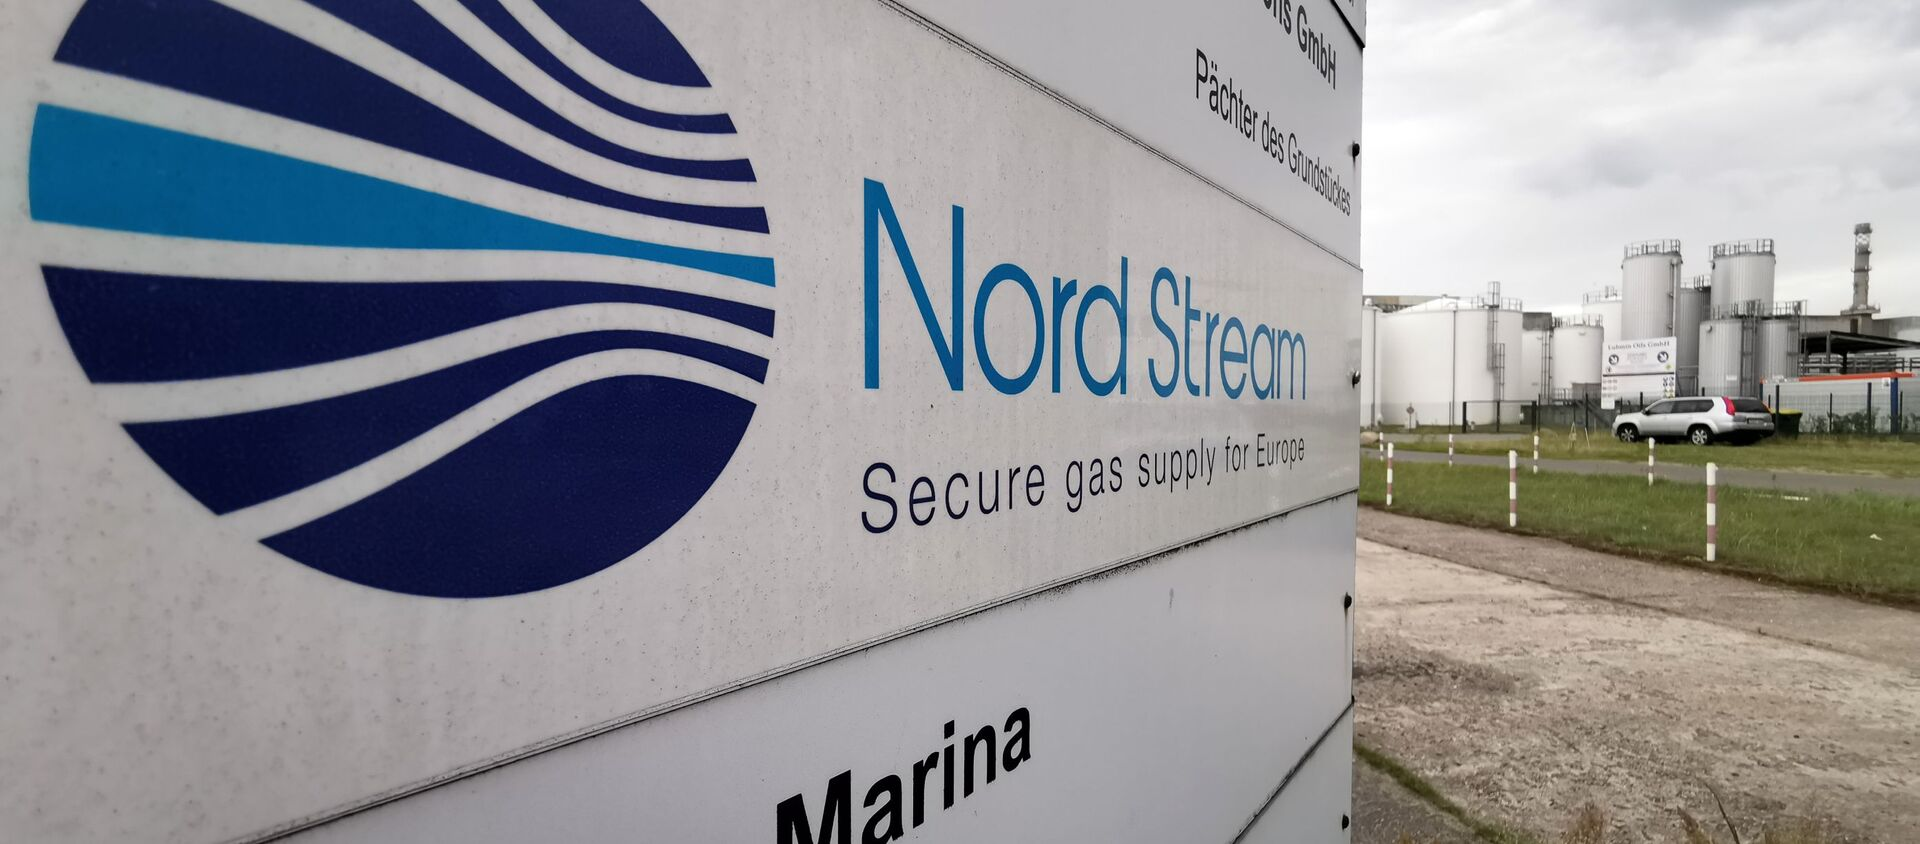 Nord Stream 2 - Sputnik Polska, 1920, 19.05.2021